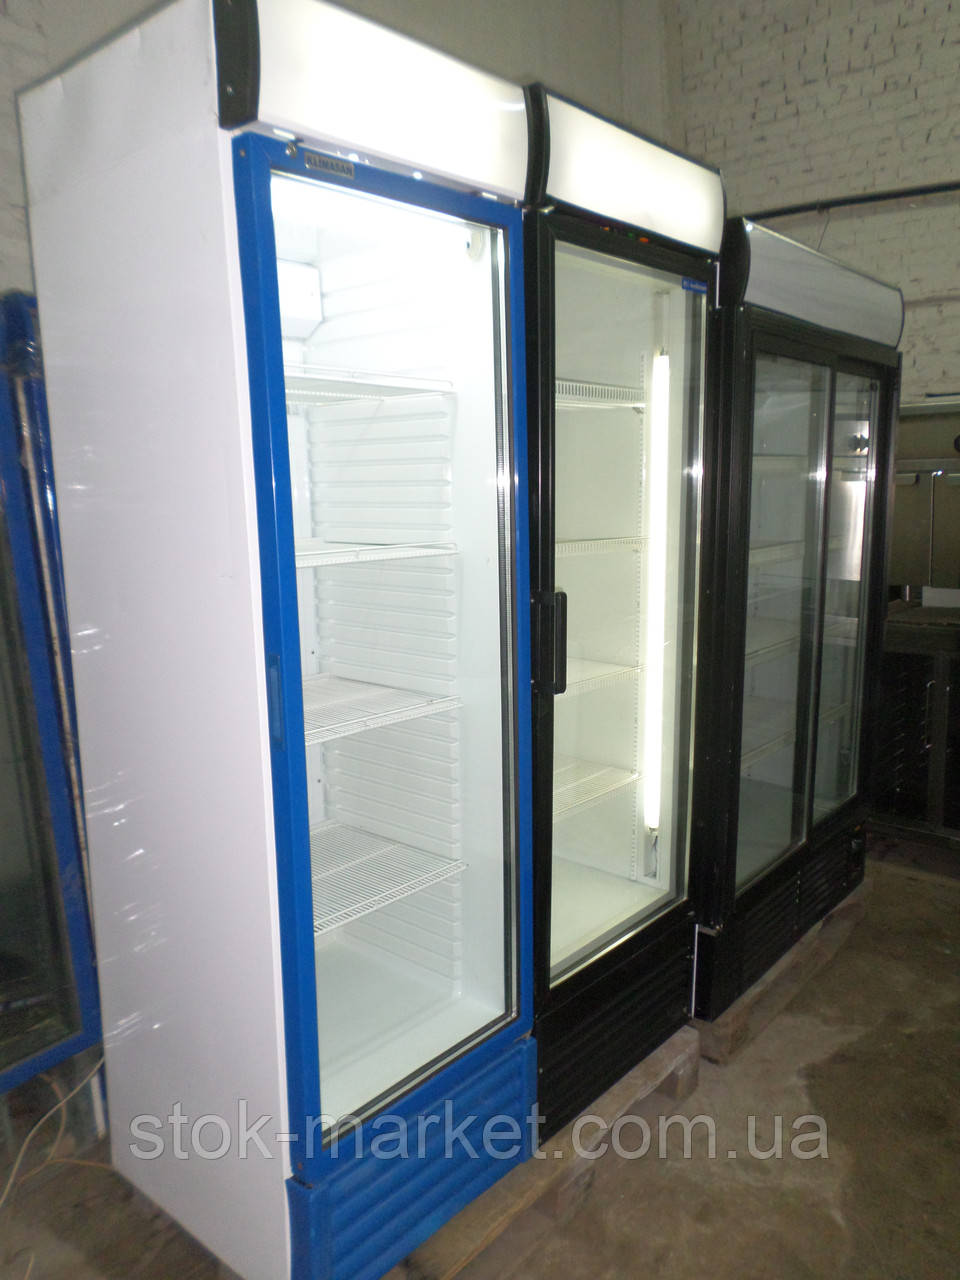 Холодильный шкаф Cold masters б/у, шкаф холодильный б у, холодильная камера б у, холодильник б у, холодильная